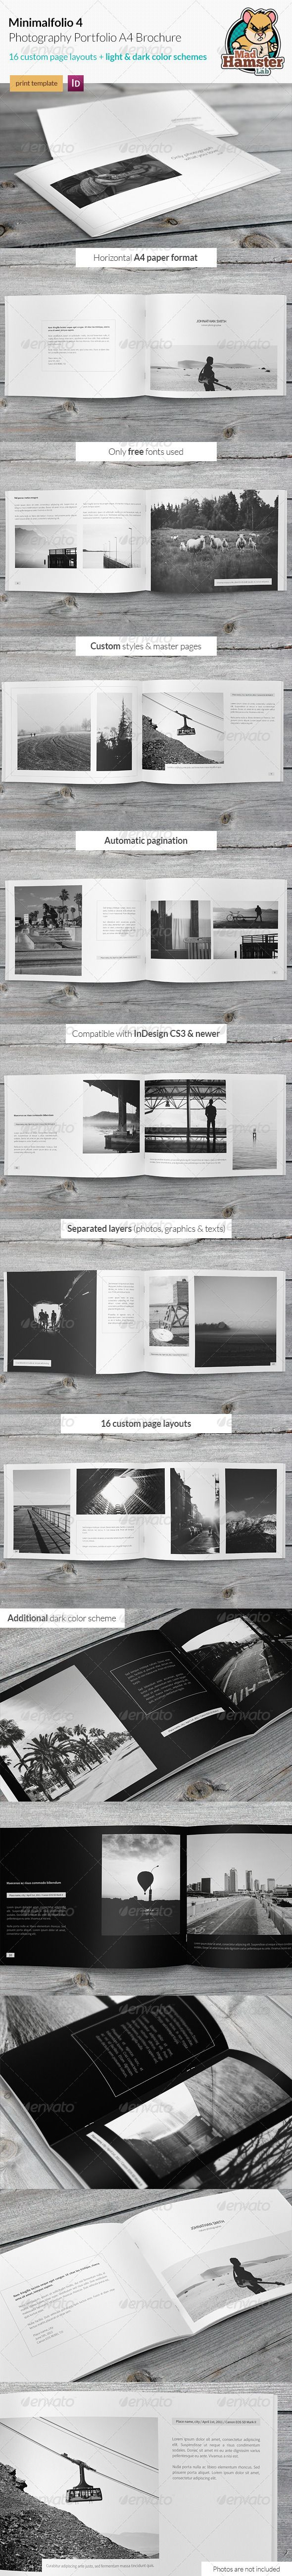 Minimalfolio 4 Photography Portfolio A4 Brochure - Portfolio Brochures